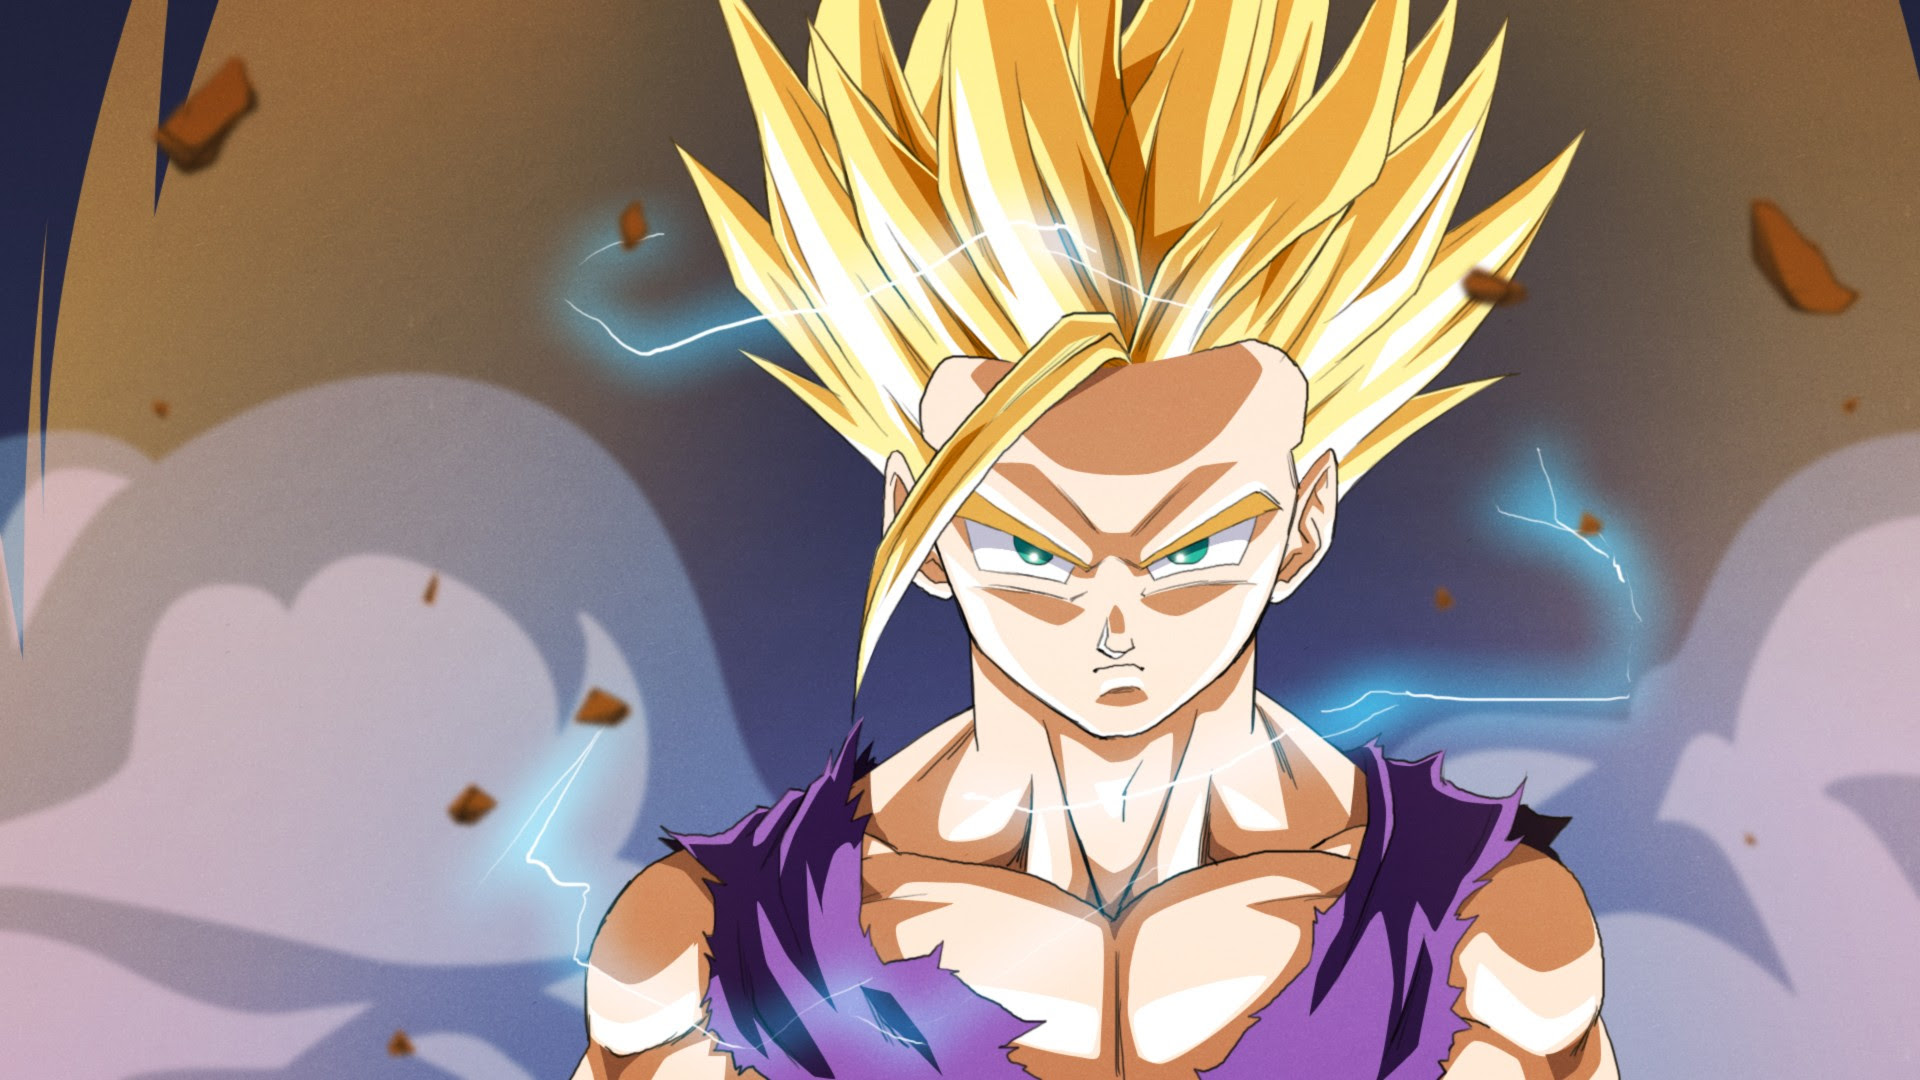 Goku Super Saiyan Dragon Ball Z Wallpaper 33842537 Fanpop